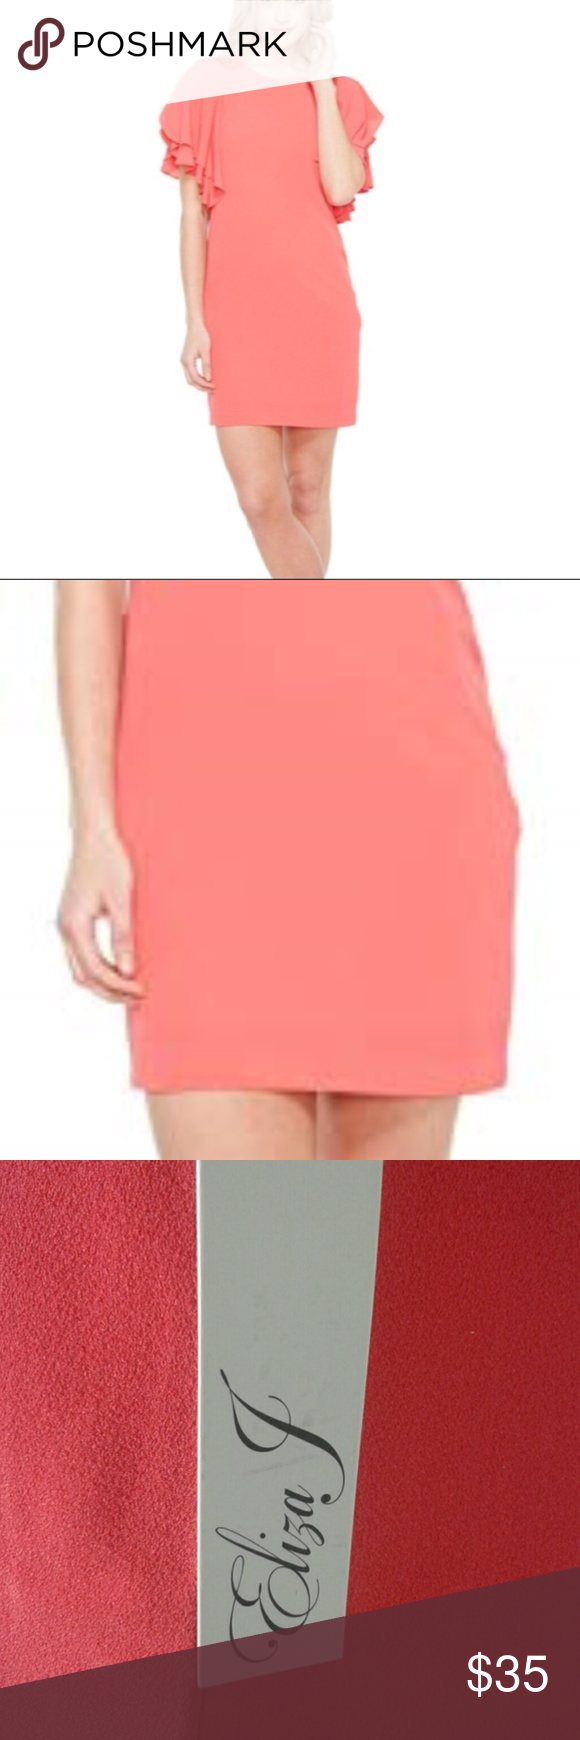 453bfb43cfe Vince Camuto sheath dress ruffle sleeve 4 New with tags msrp  148 vince  camuto sheath dress